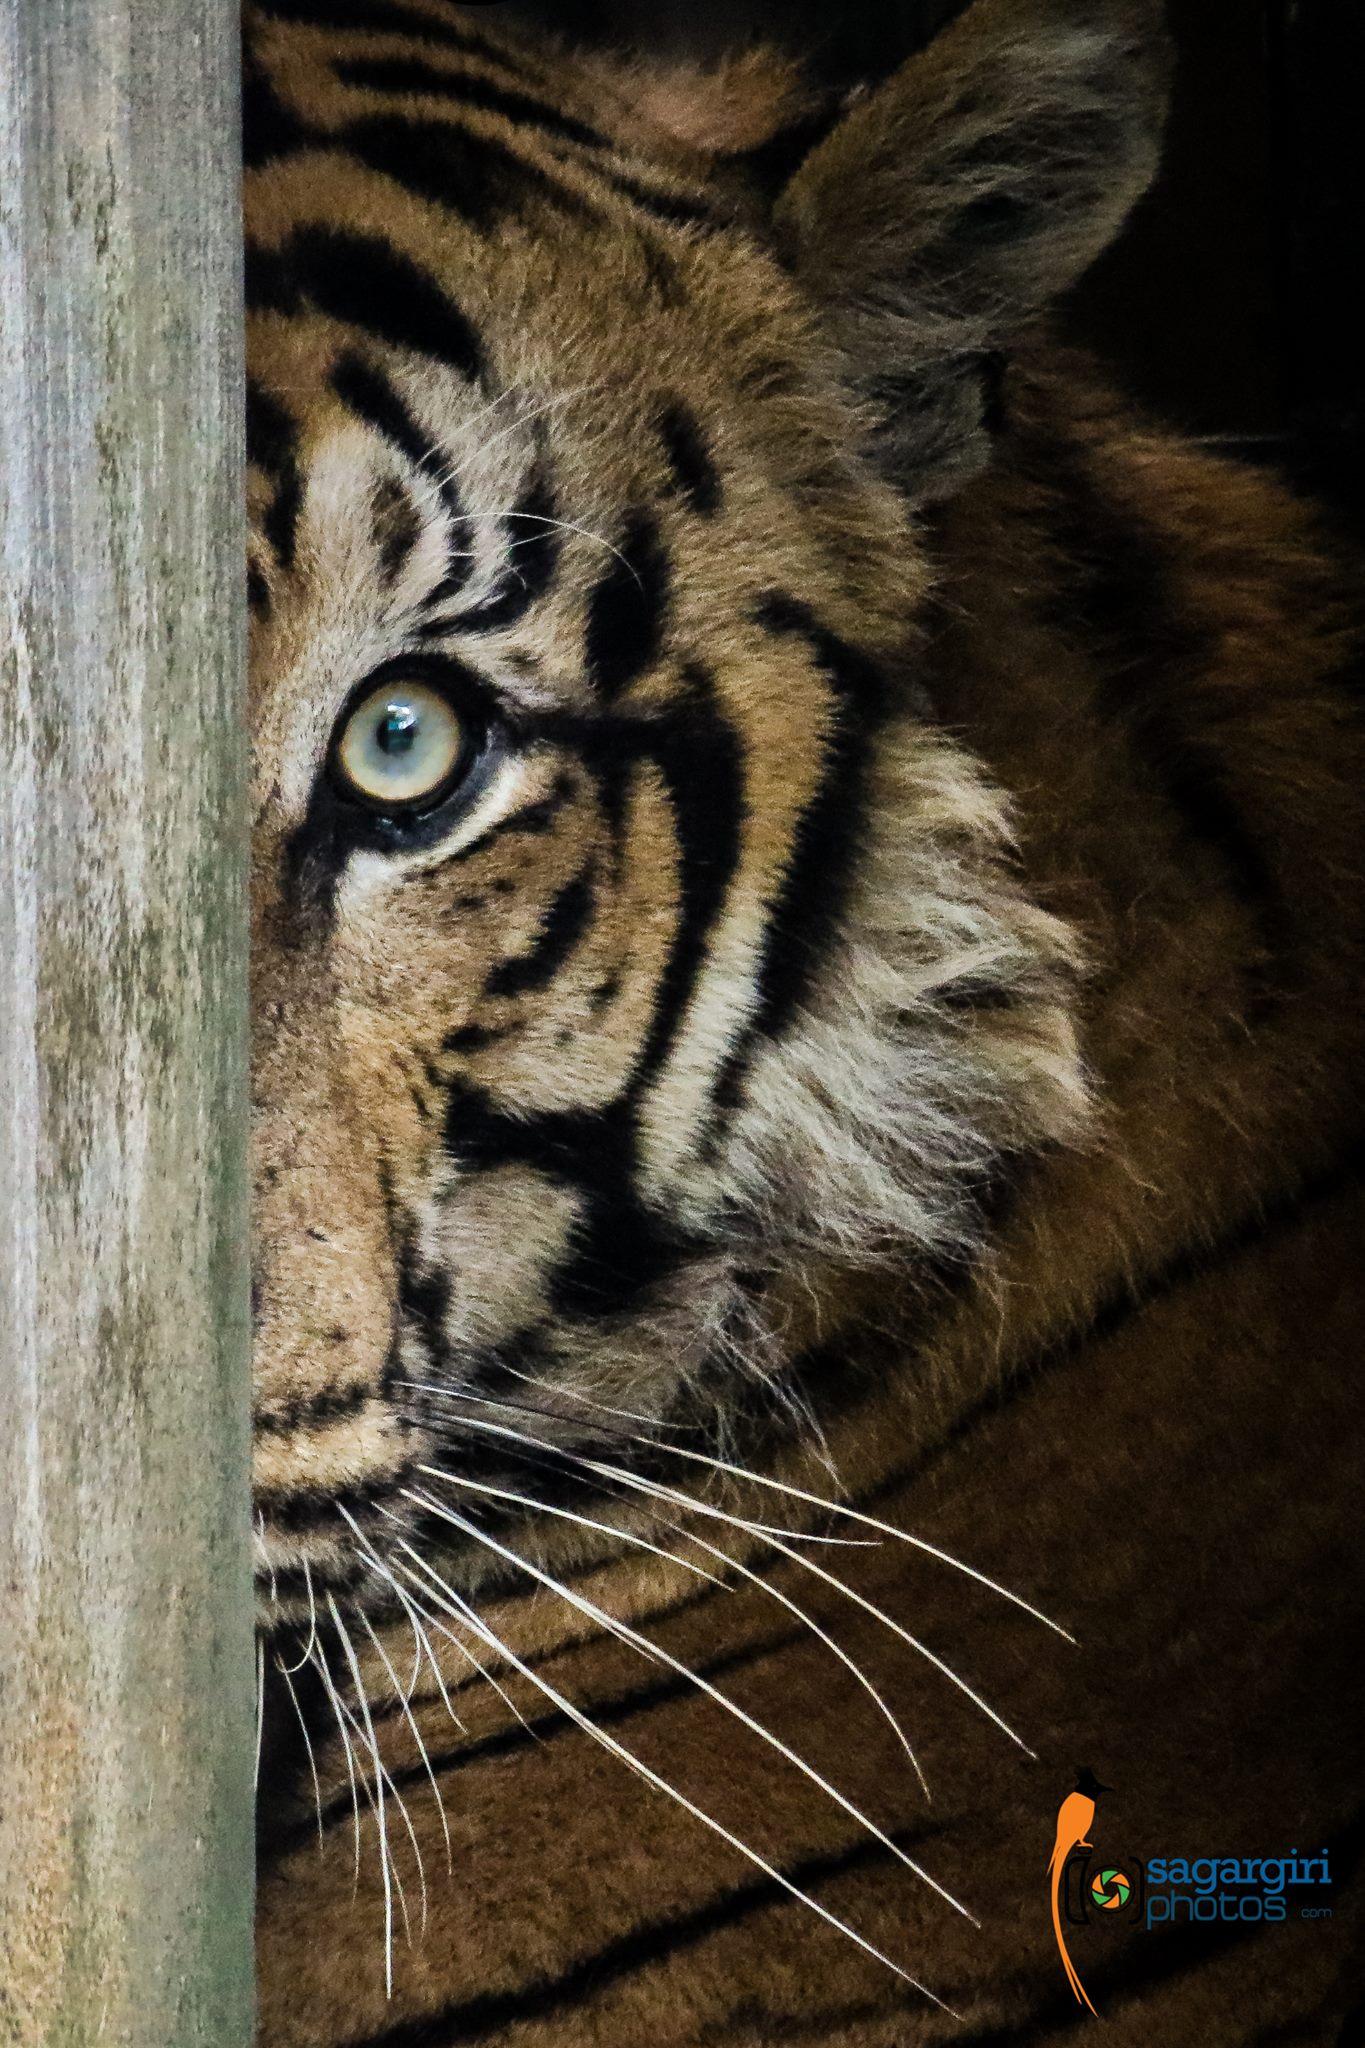 tigr watching.jpg